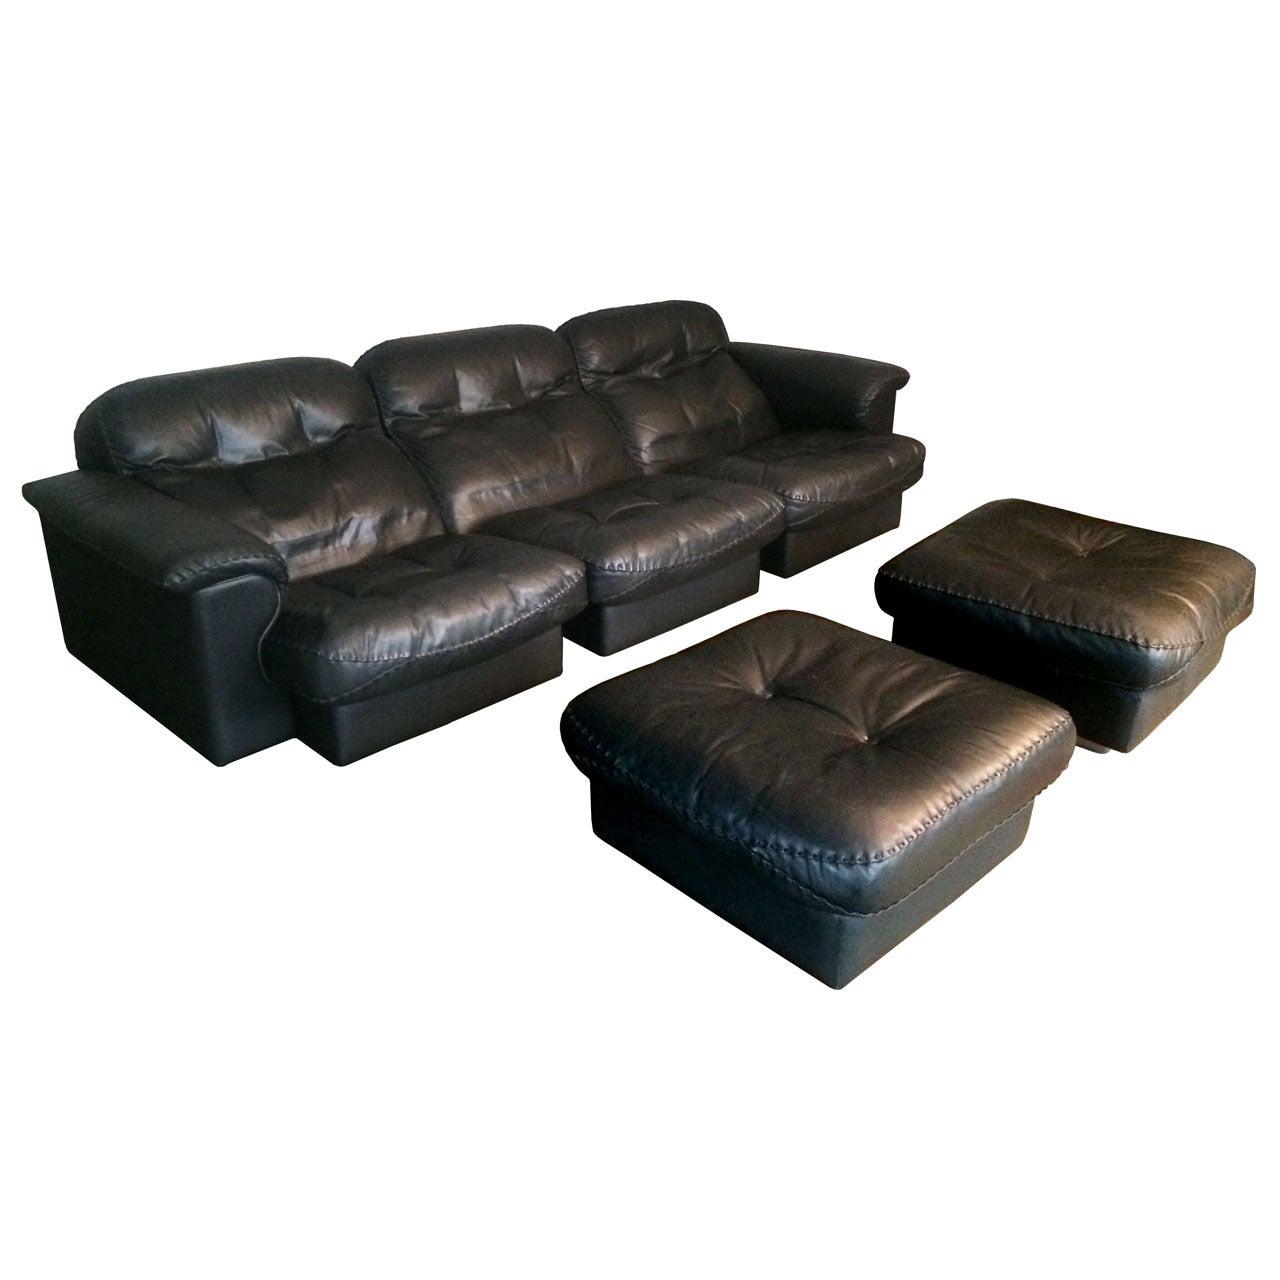 DeSede 3 Seater Sofa in Black Leather